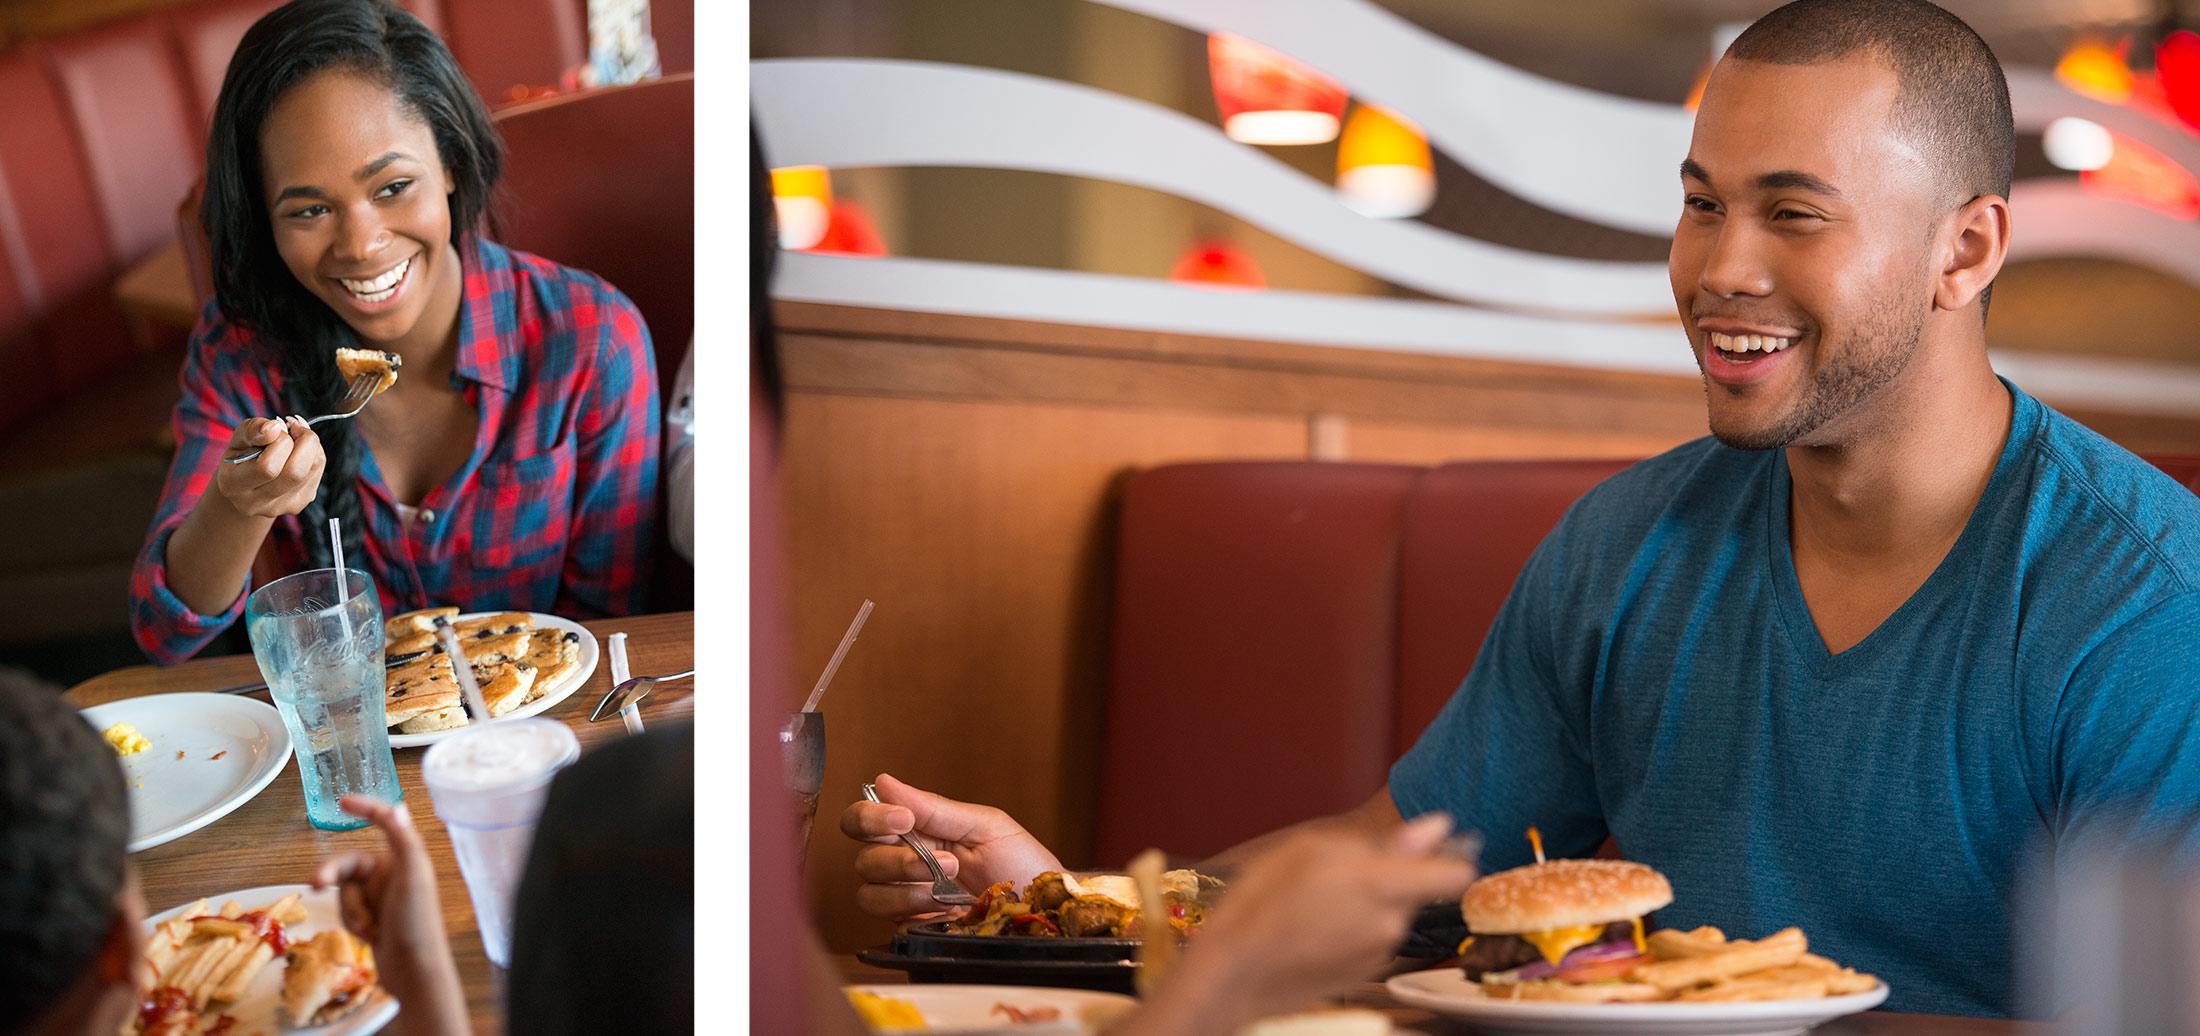 Restaurant-Advertising-Photography-ZRS.jpg